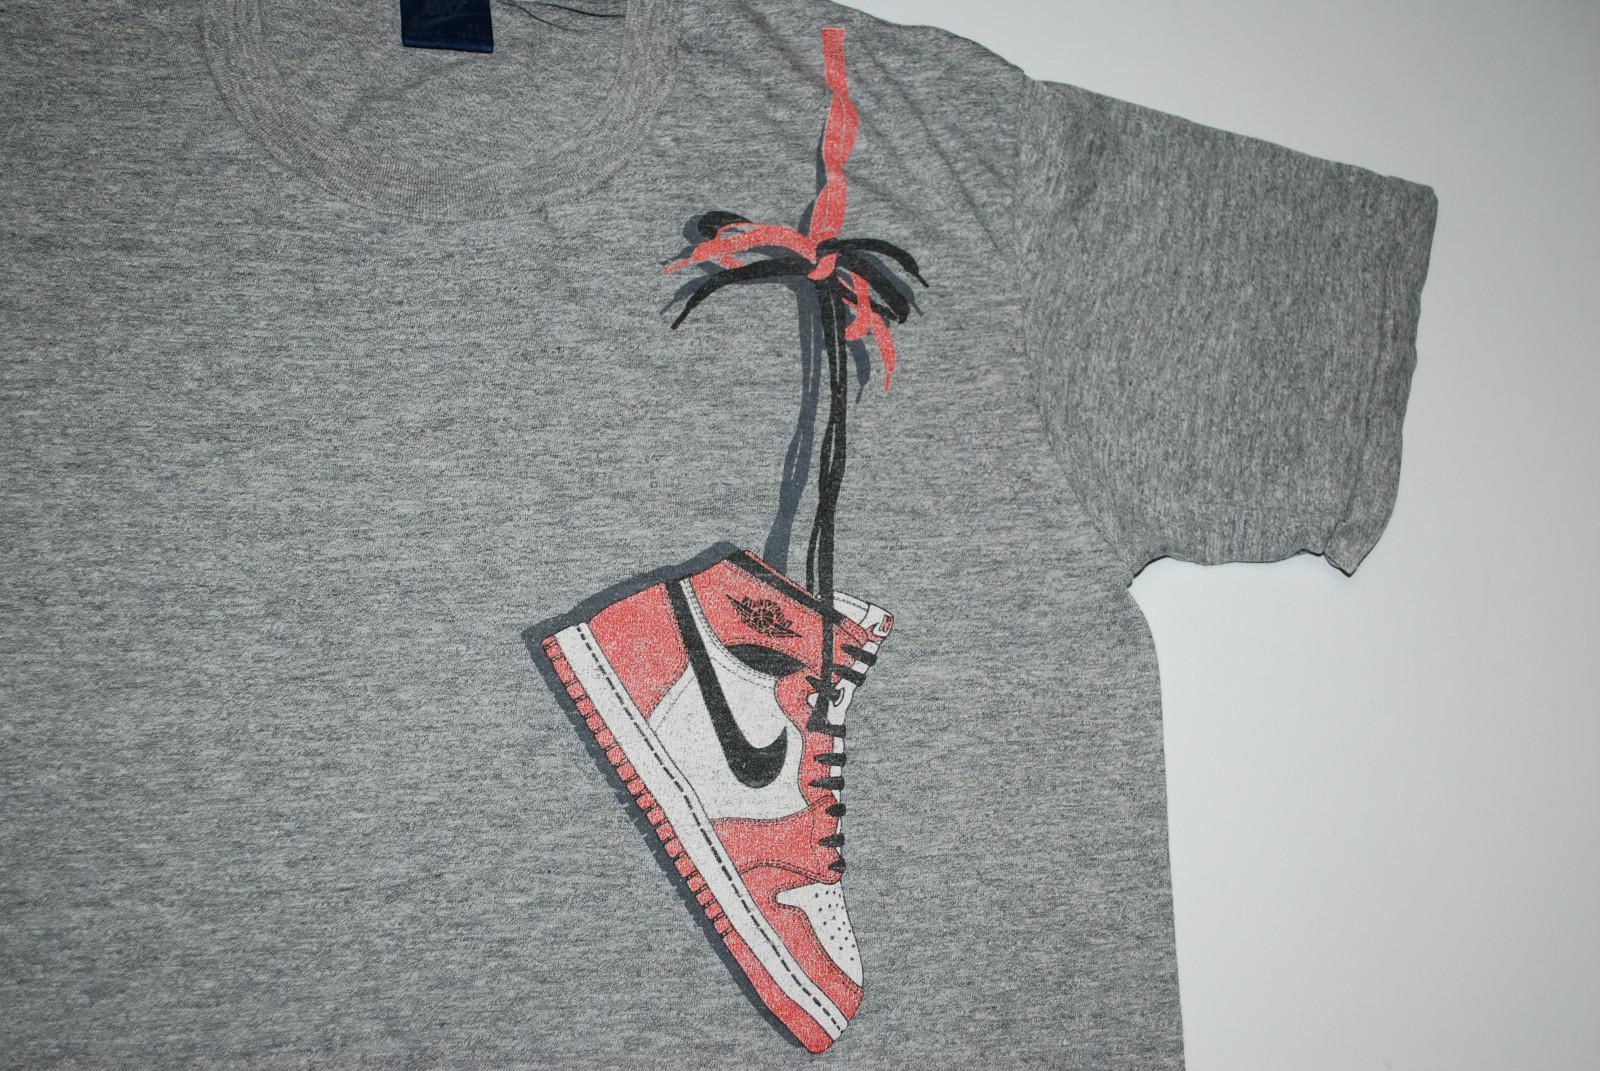 7be94605bab7a0 http   www.ebay.com itm VTG-NIKE-BLUE-TAG-AIR-JORDAN-FIRST-JORDAN-SHOES -RAYON-SHIRT-1980S-XL-ORIGINAL- 350692944984 pt Vintage Unisex T Shirts hash   ...